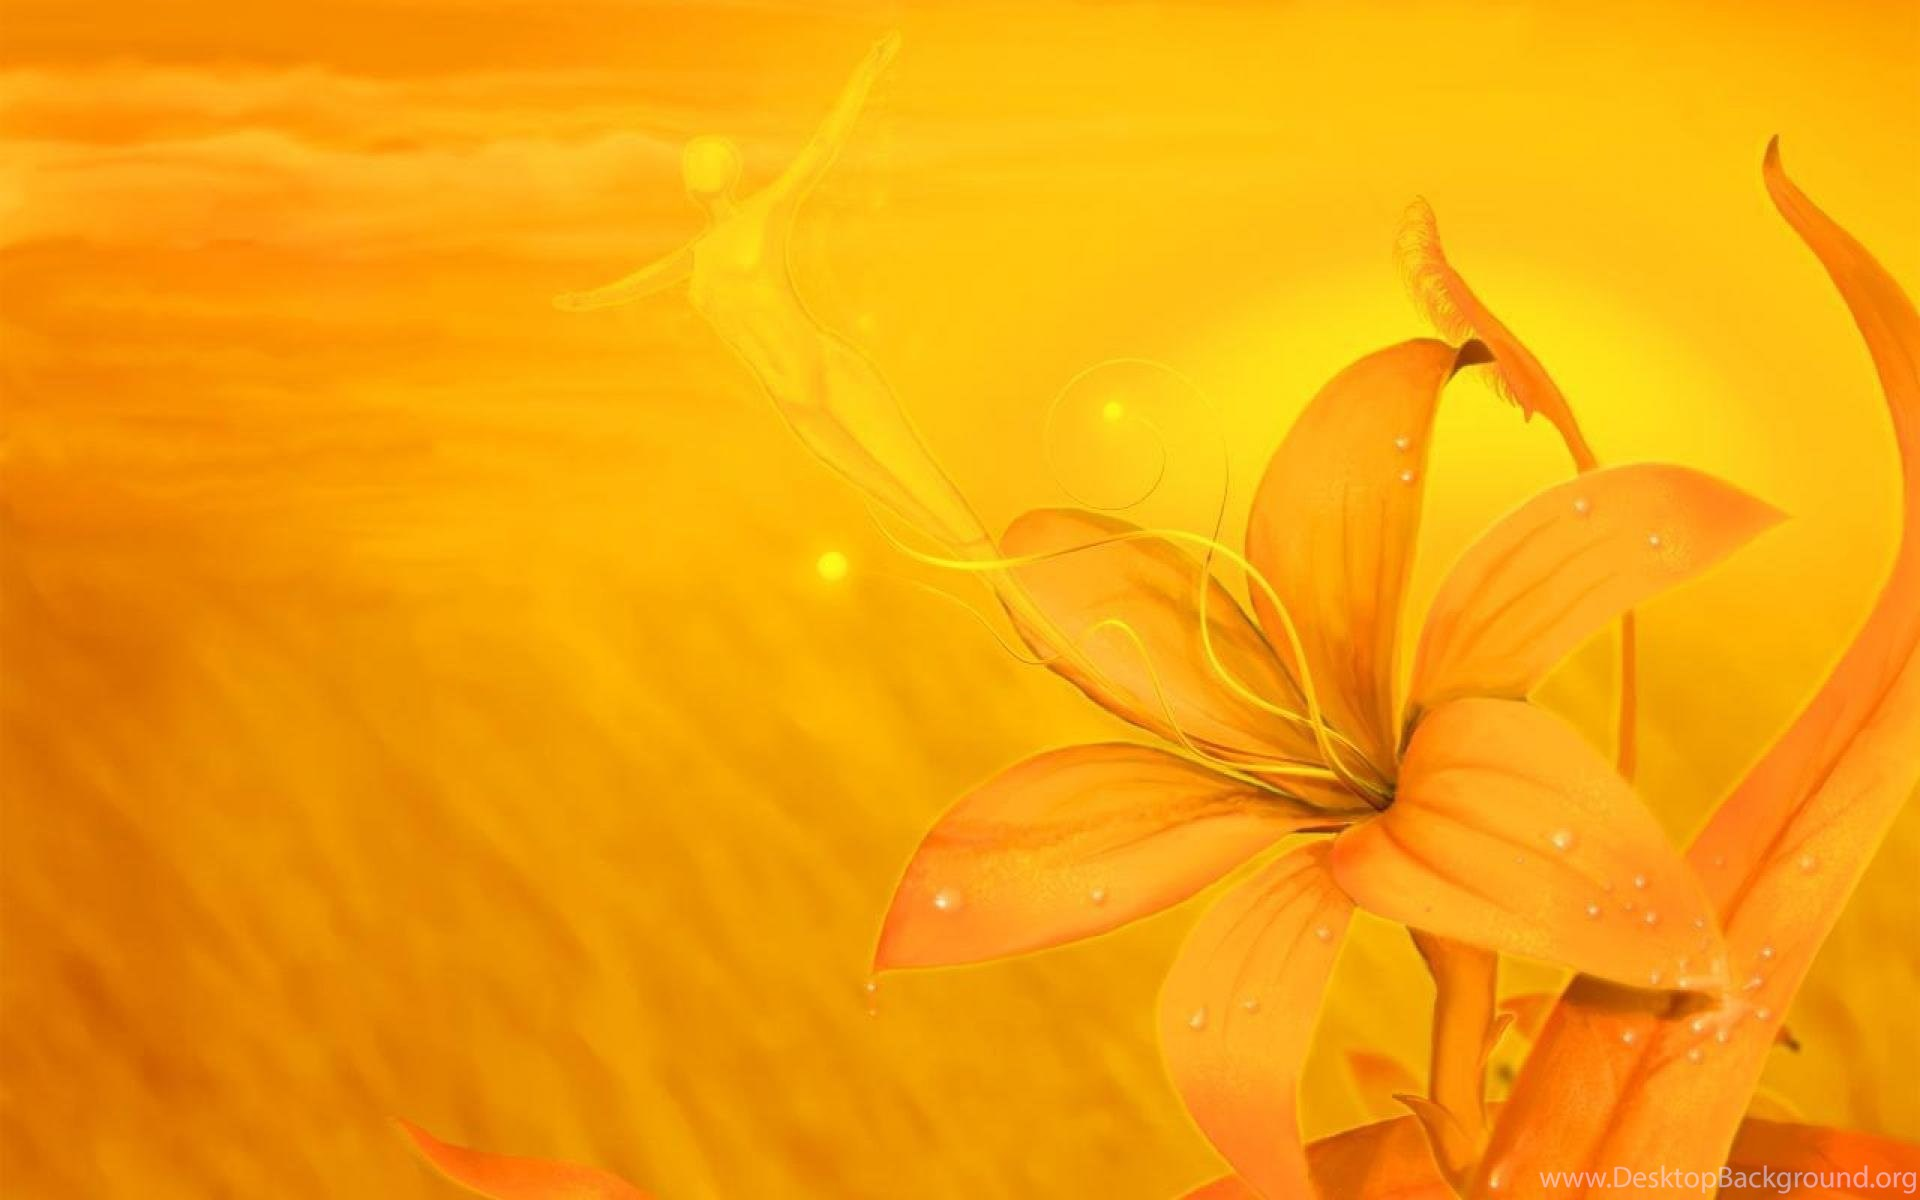 yellow flowers backgrounds wallpapers walldevil best orange flower 1920x1200 download hd wallpaper wallpapertip yellow flowers backgrounds wallpapers